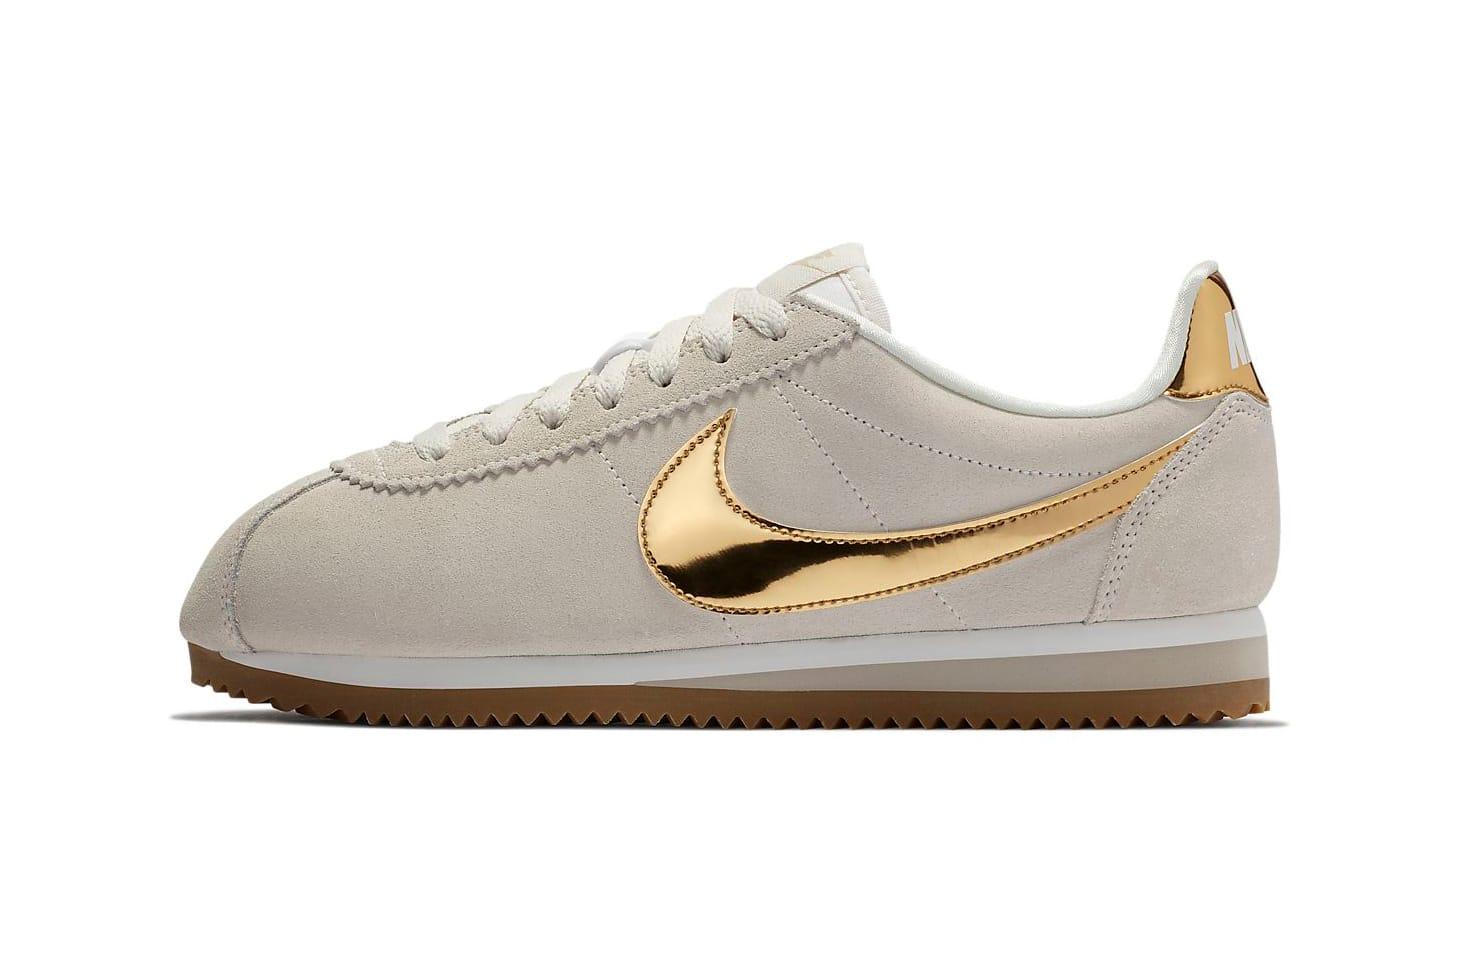 Nike Cortez Phantom with Metallic Gold Swoosh